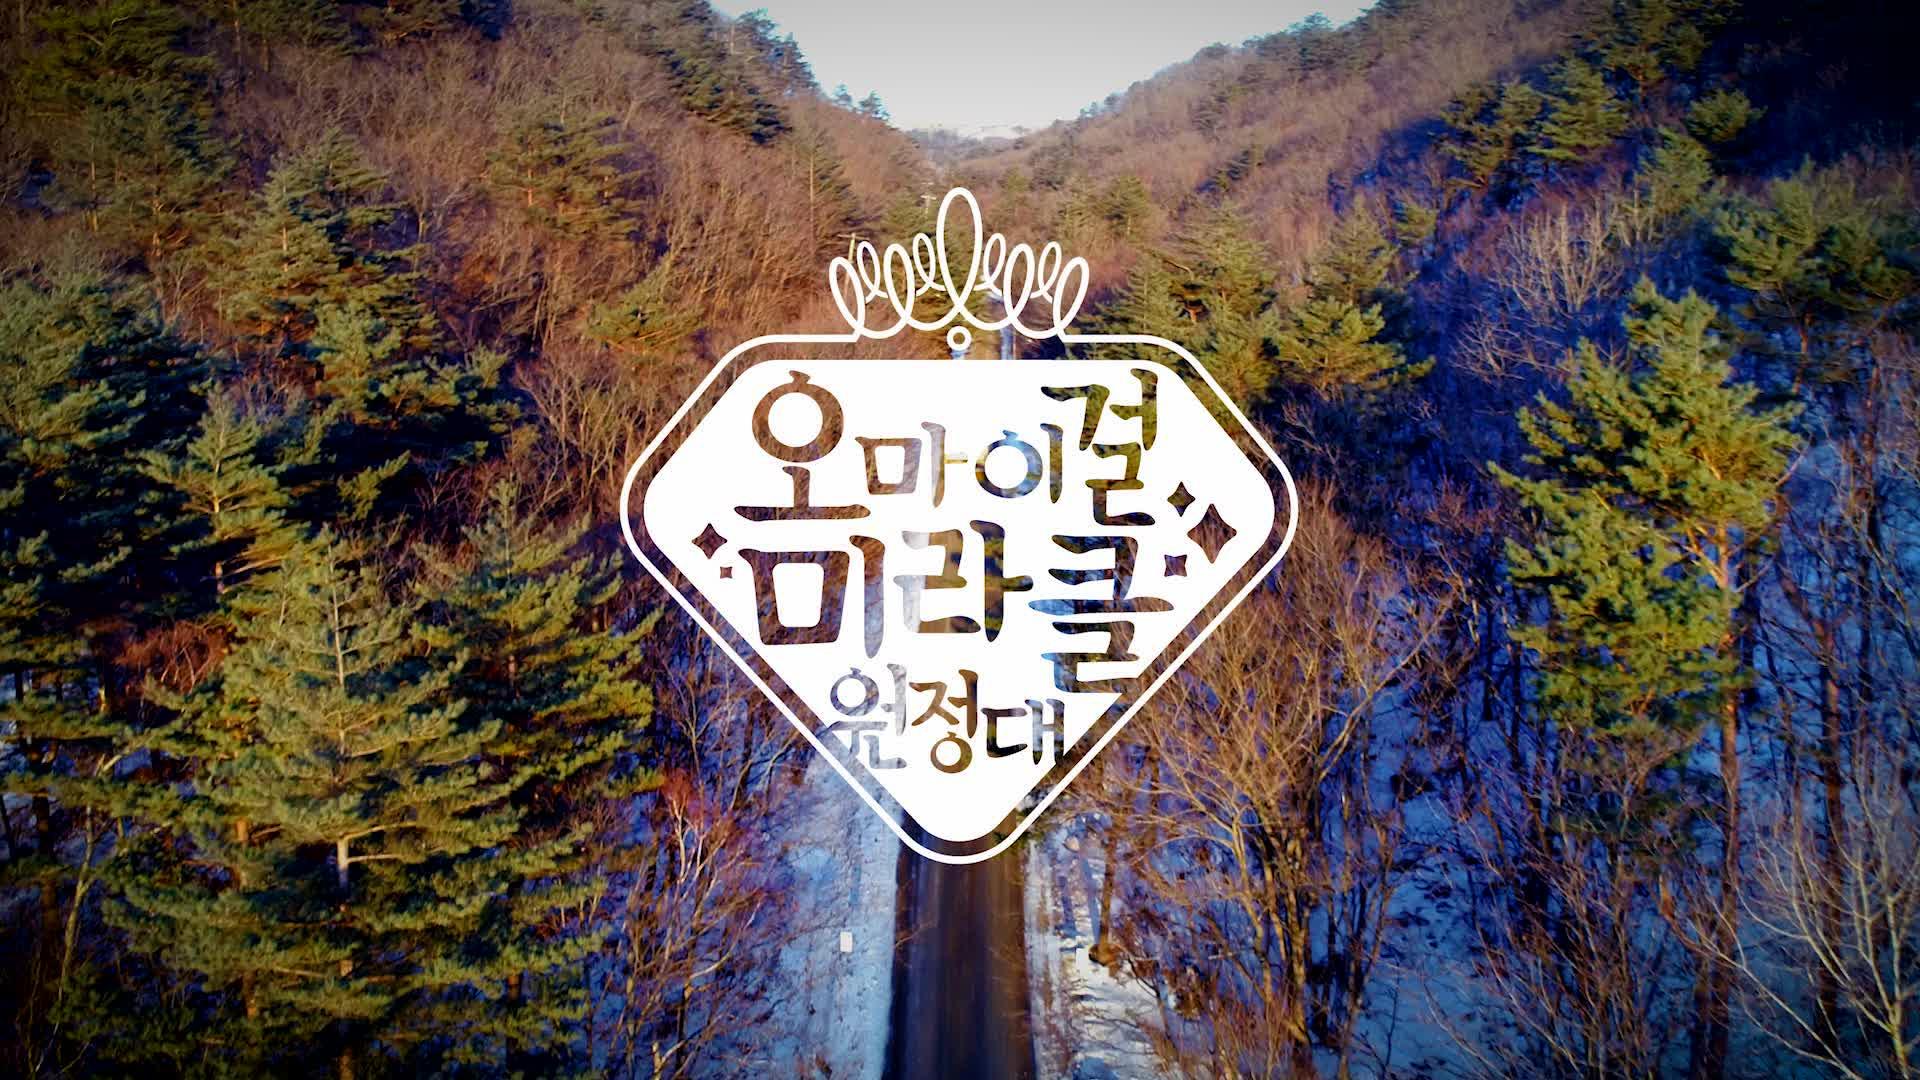 [teaser] 오마이걸 미라클 원정대 OHMYGIRL REALITY 1월 25일 저녁8시 20분 첫 공개!